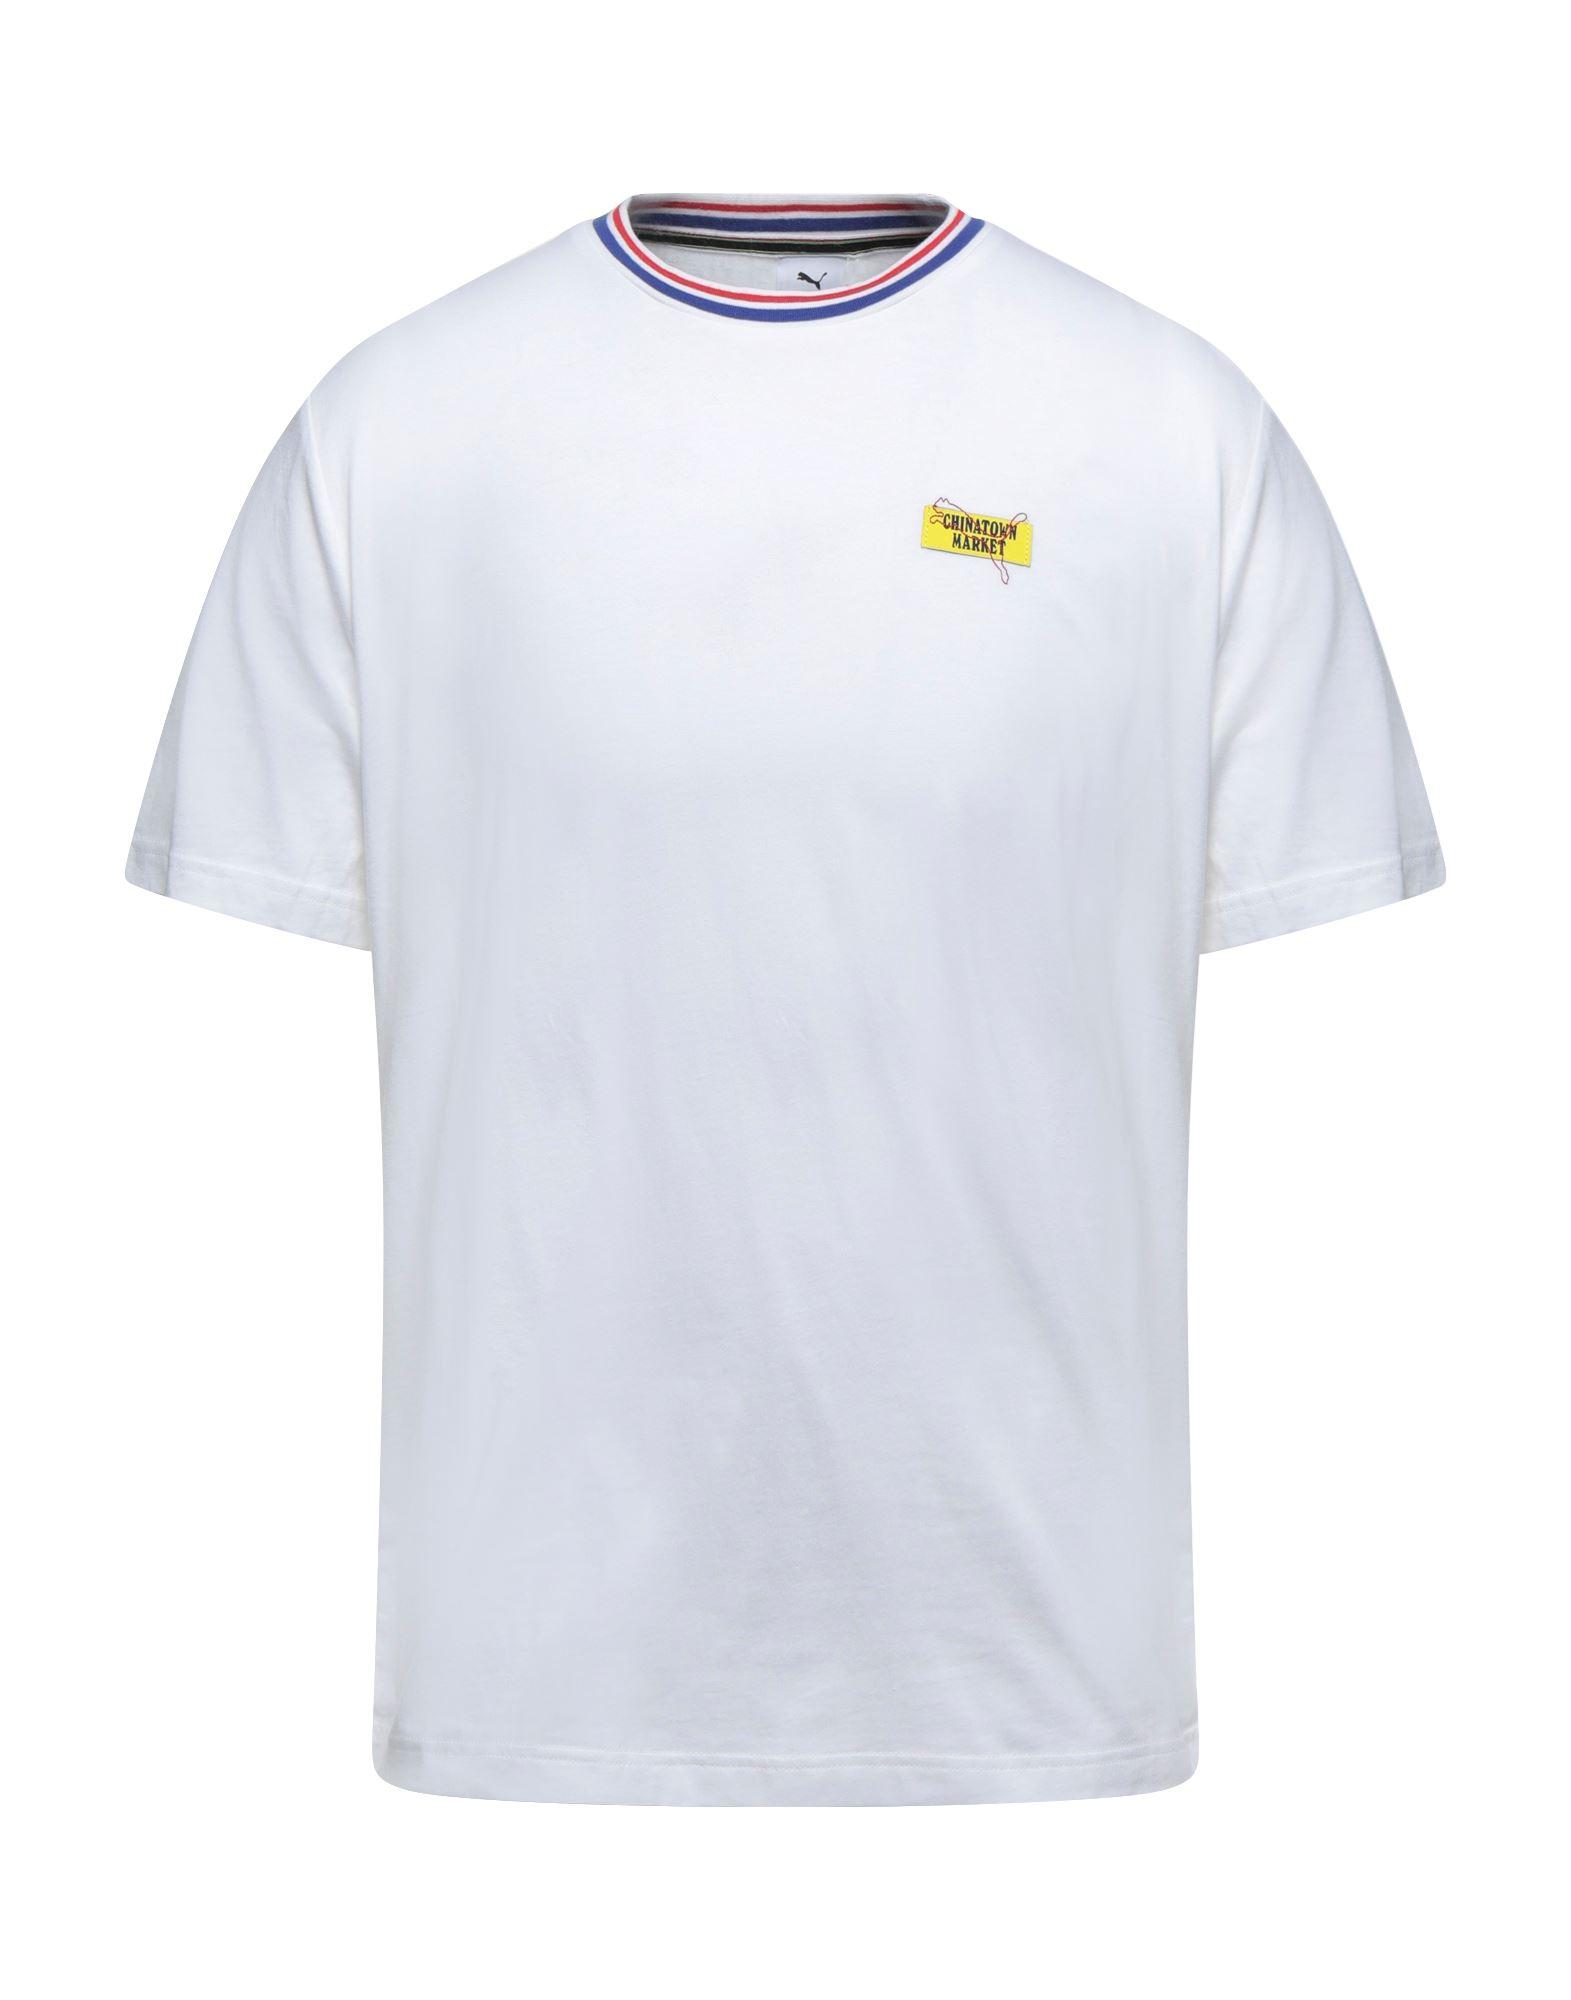 Фото - PUMA x CHINATOWN MARKET Футболка puma x porsche design футболка